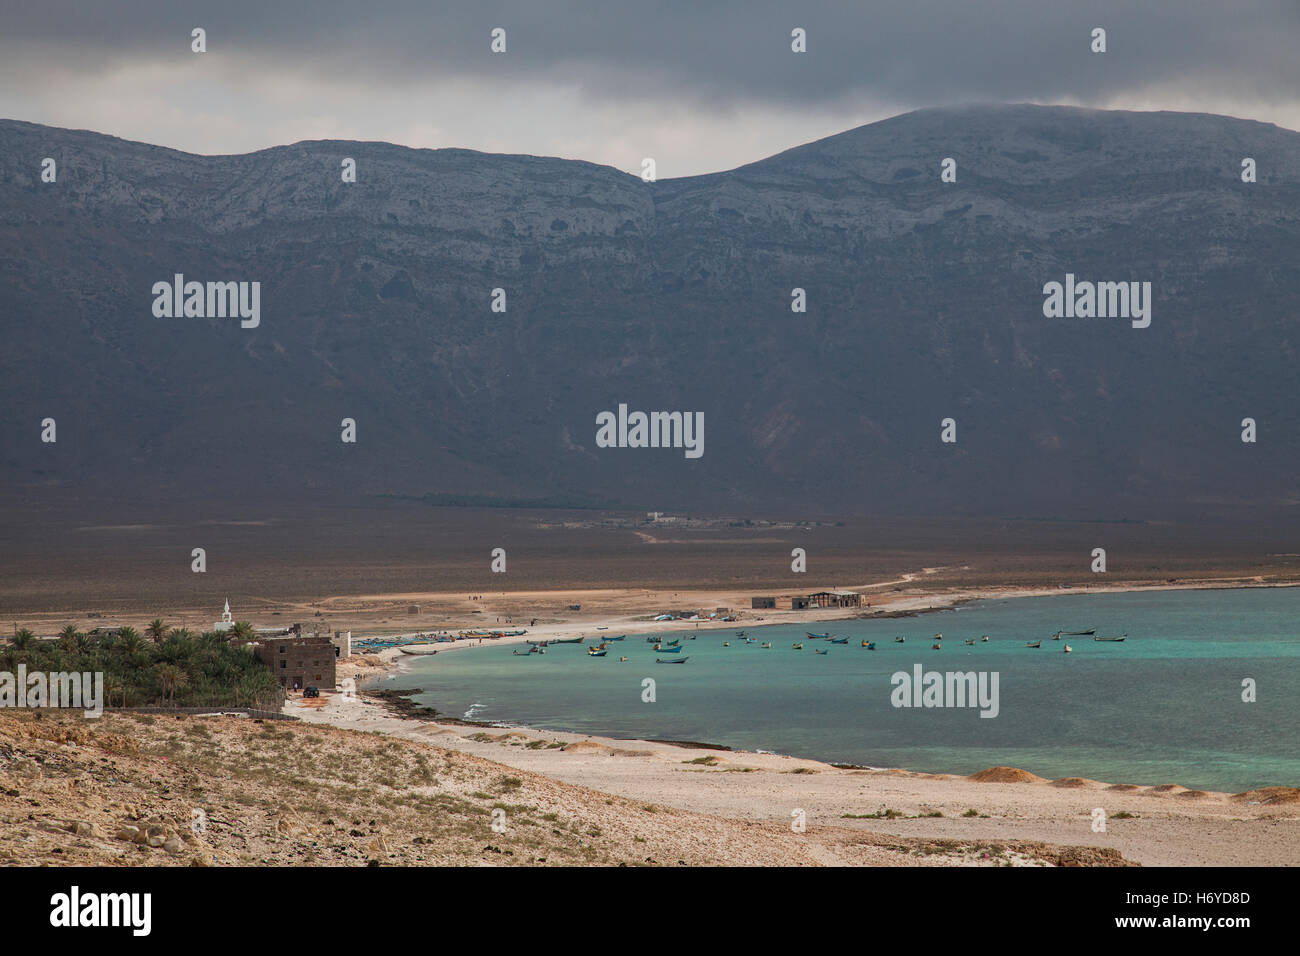 Seaside of Socotra in Yemen - Stock Image